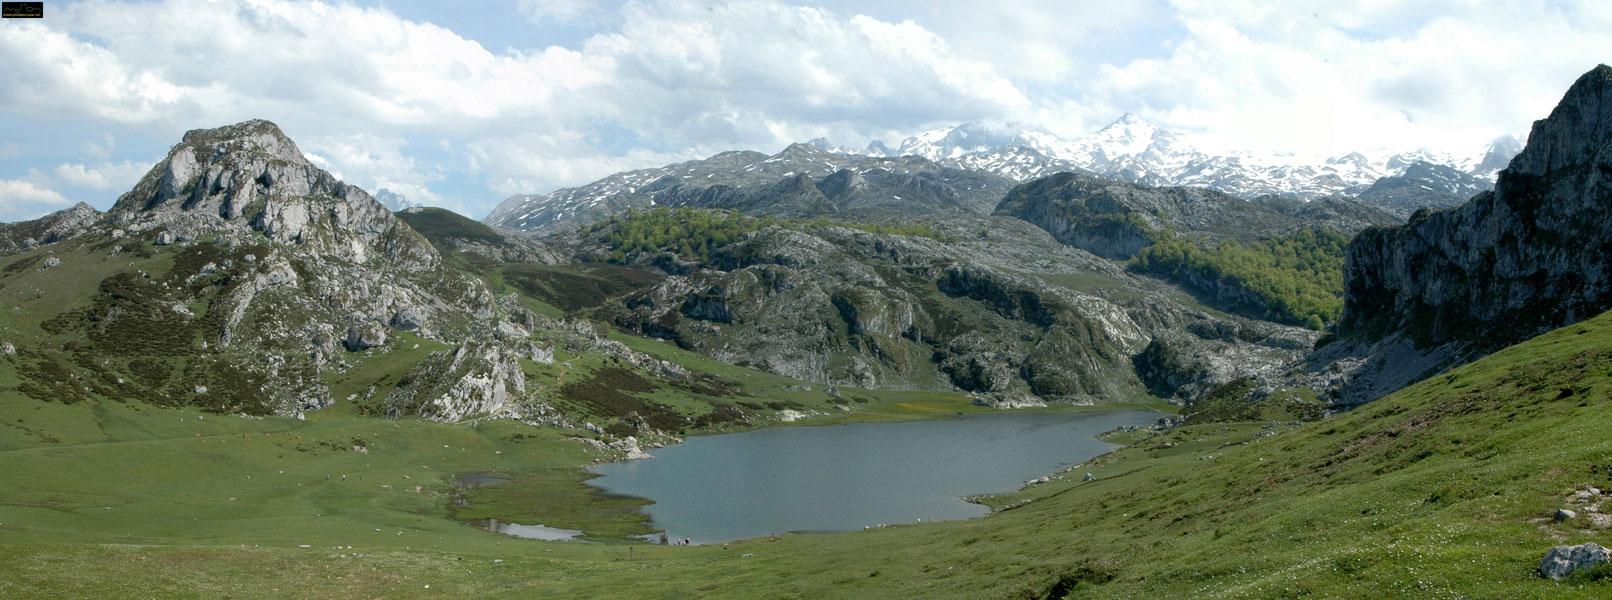 Panoramica lago ercina covadonga cangas de onis for Oficina turismo cangas de onis